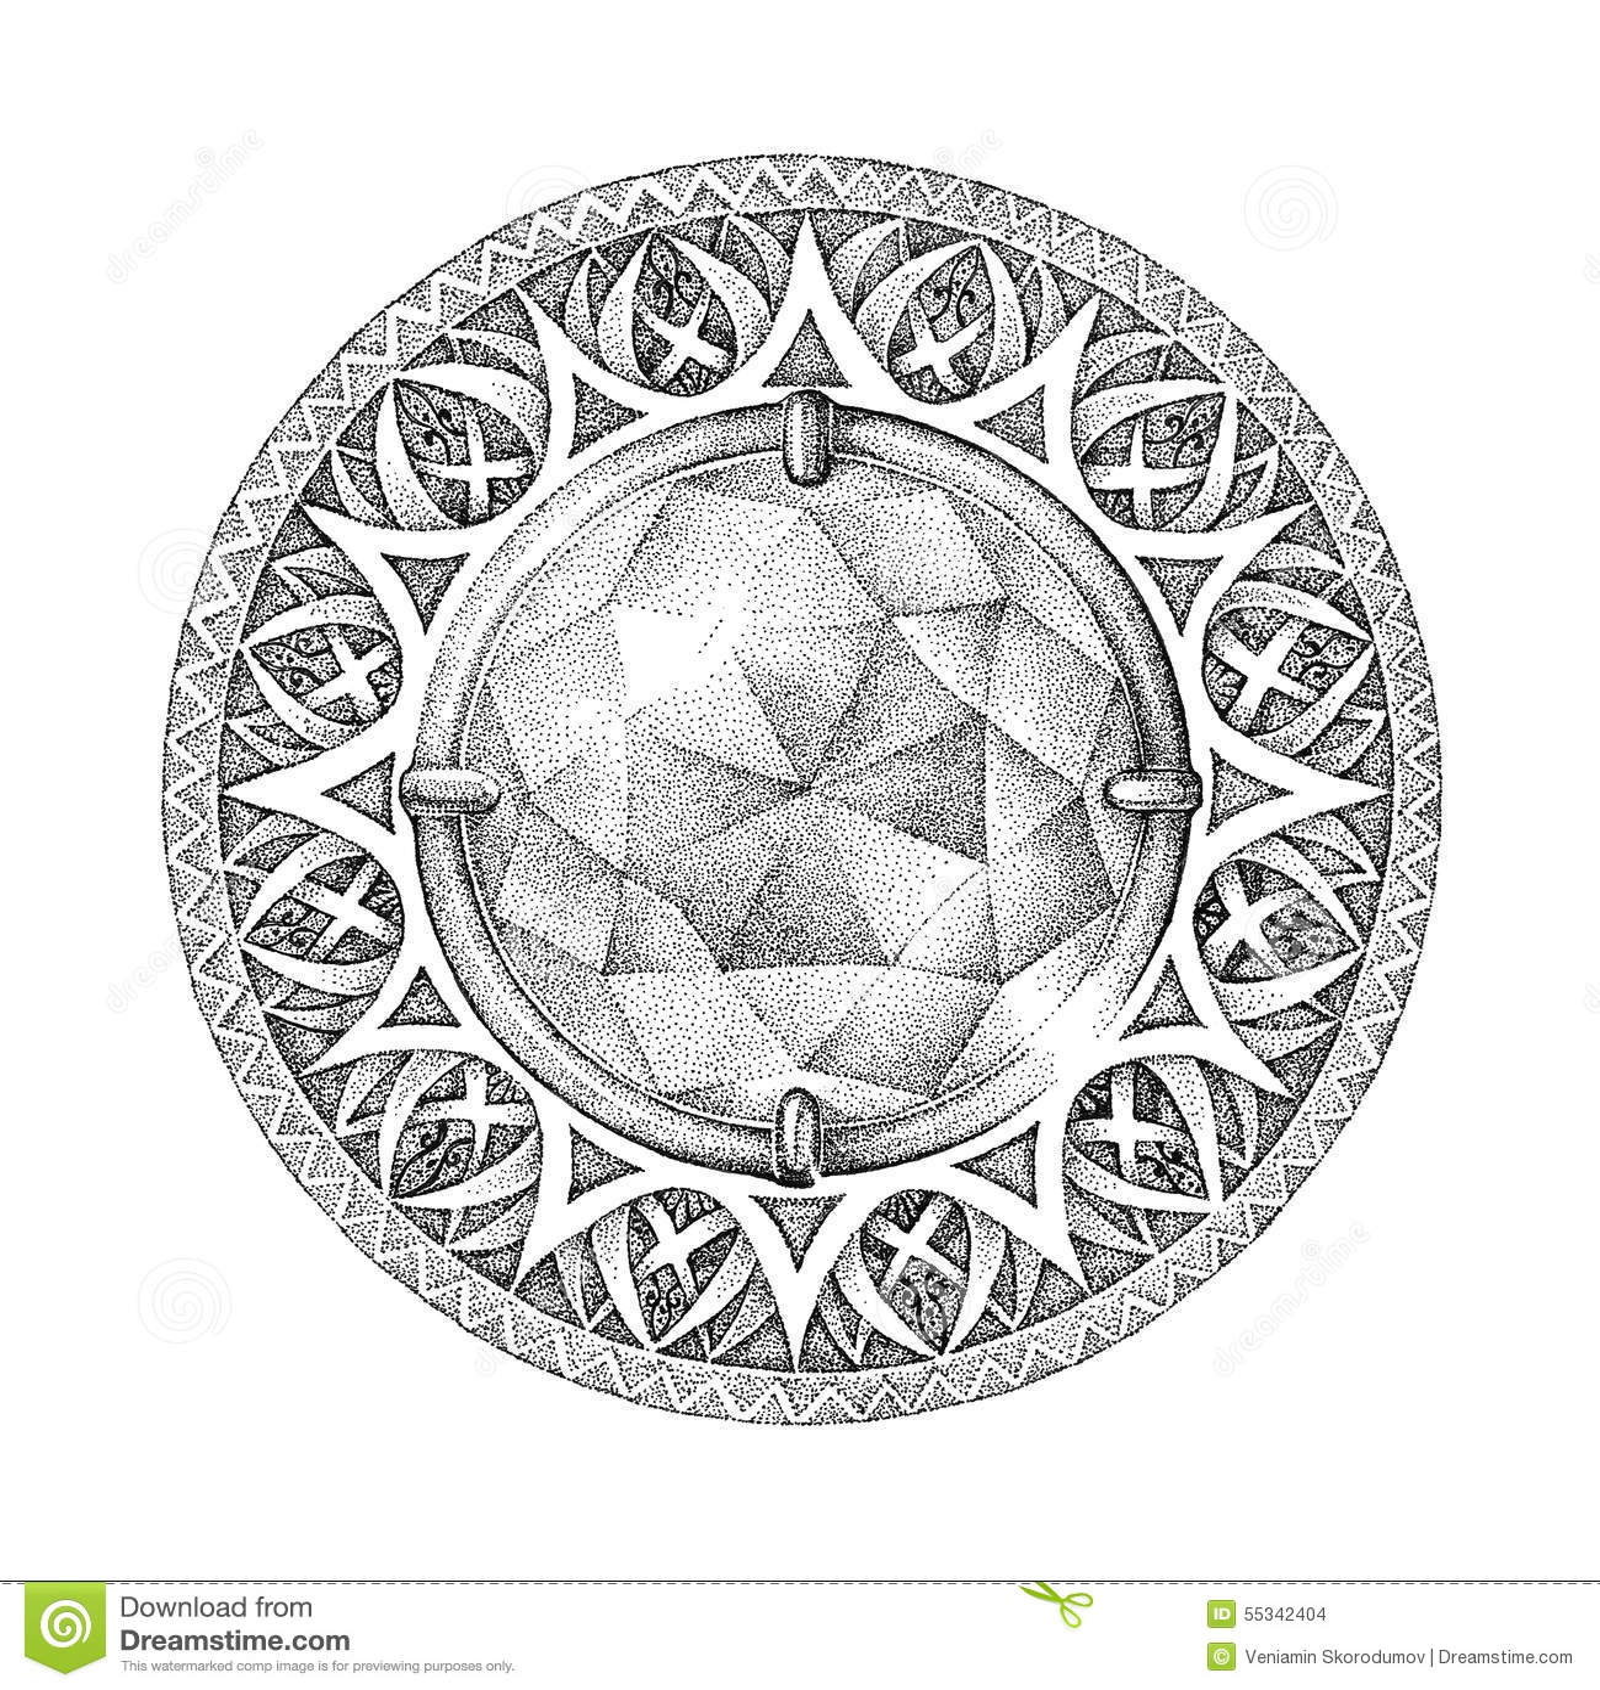 Mandala With A Brilliant Diamond Whith Patterns